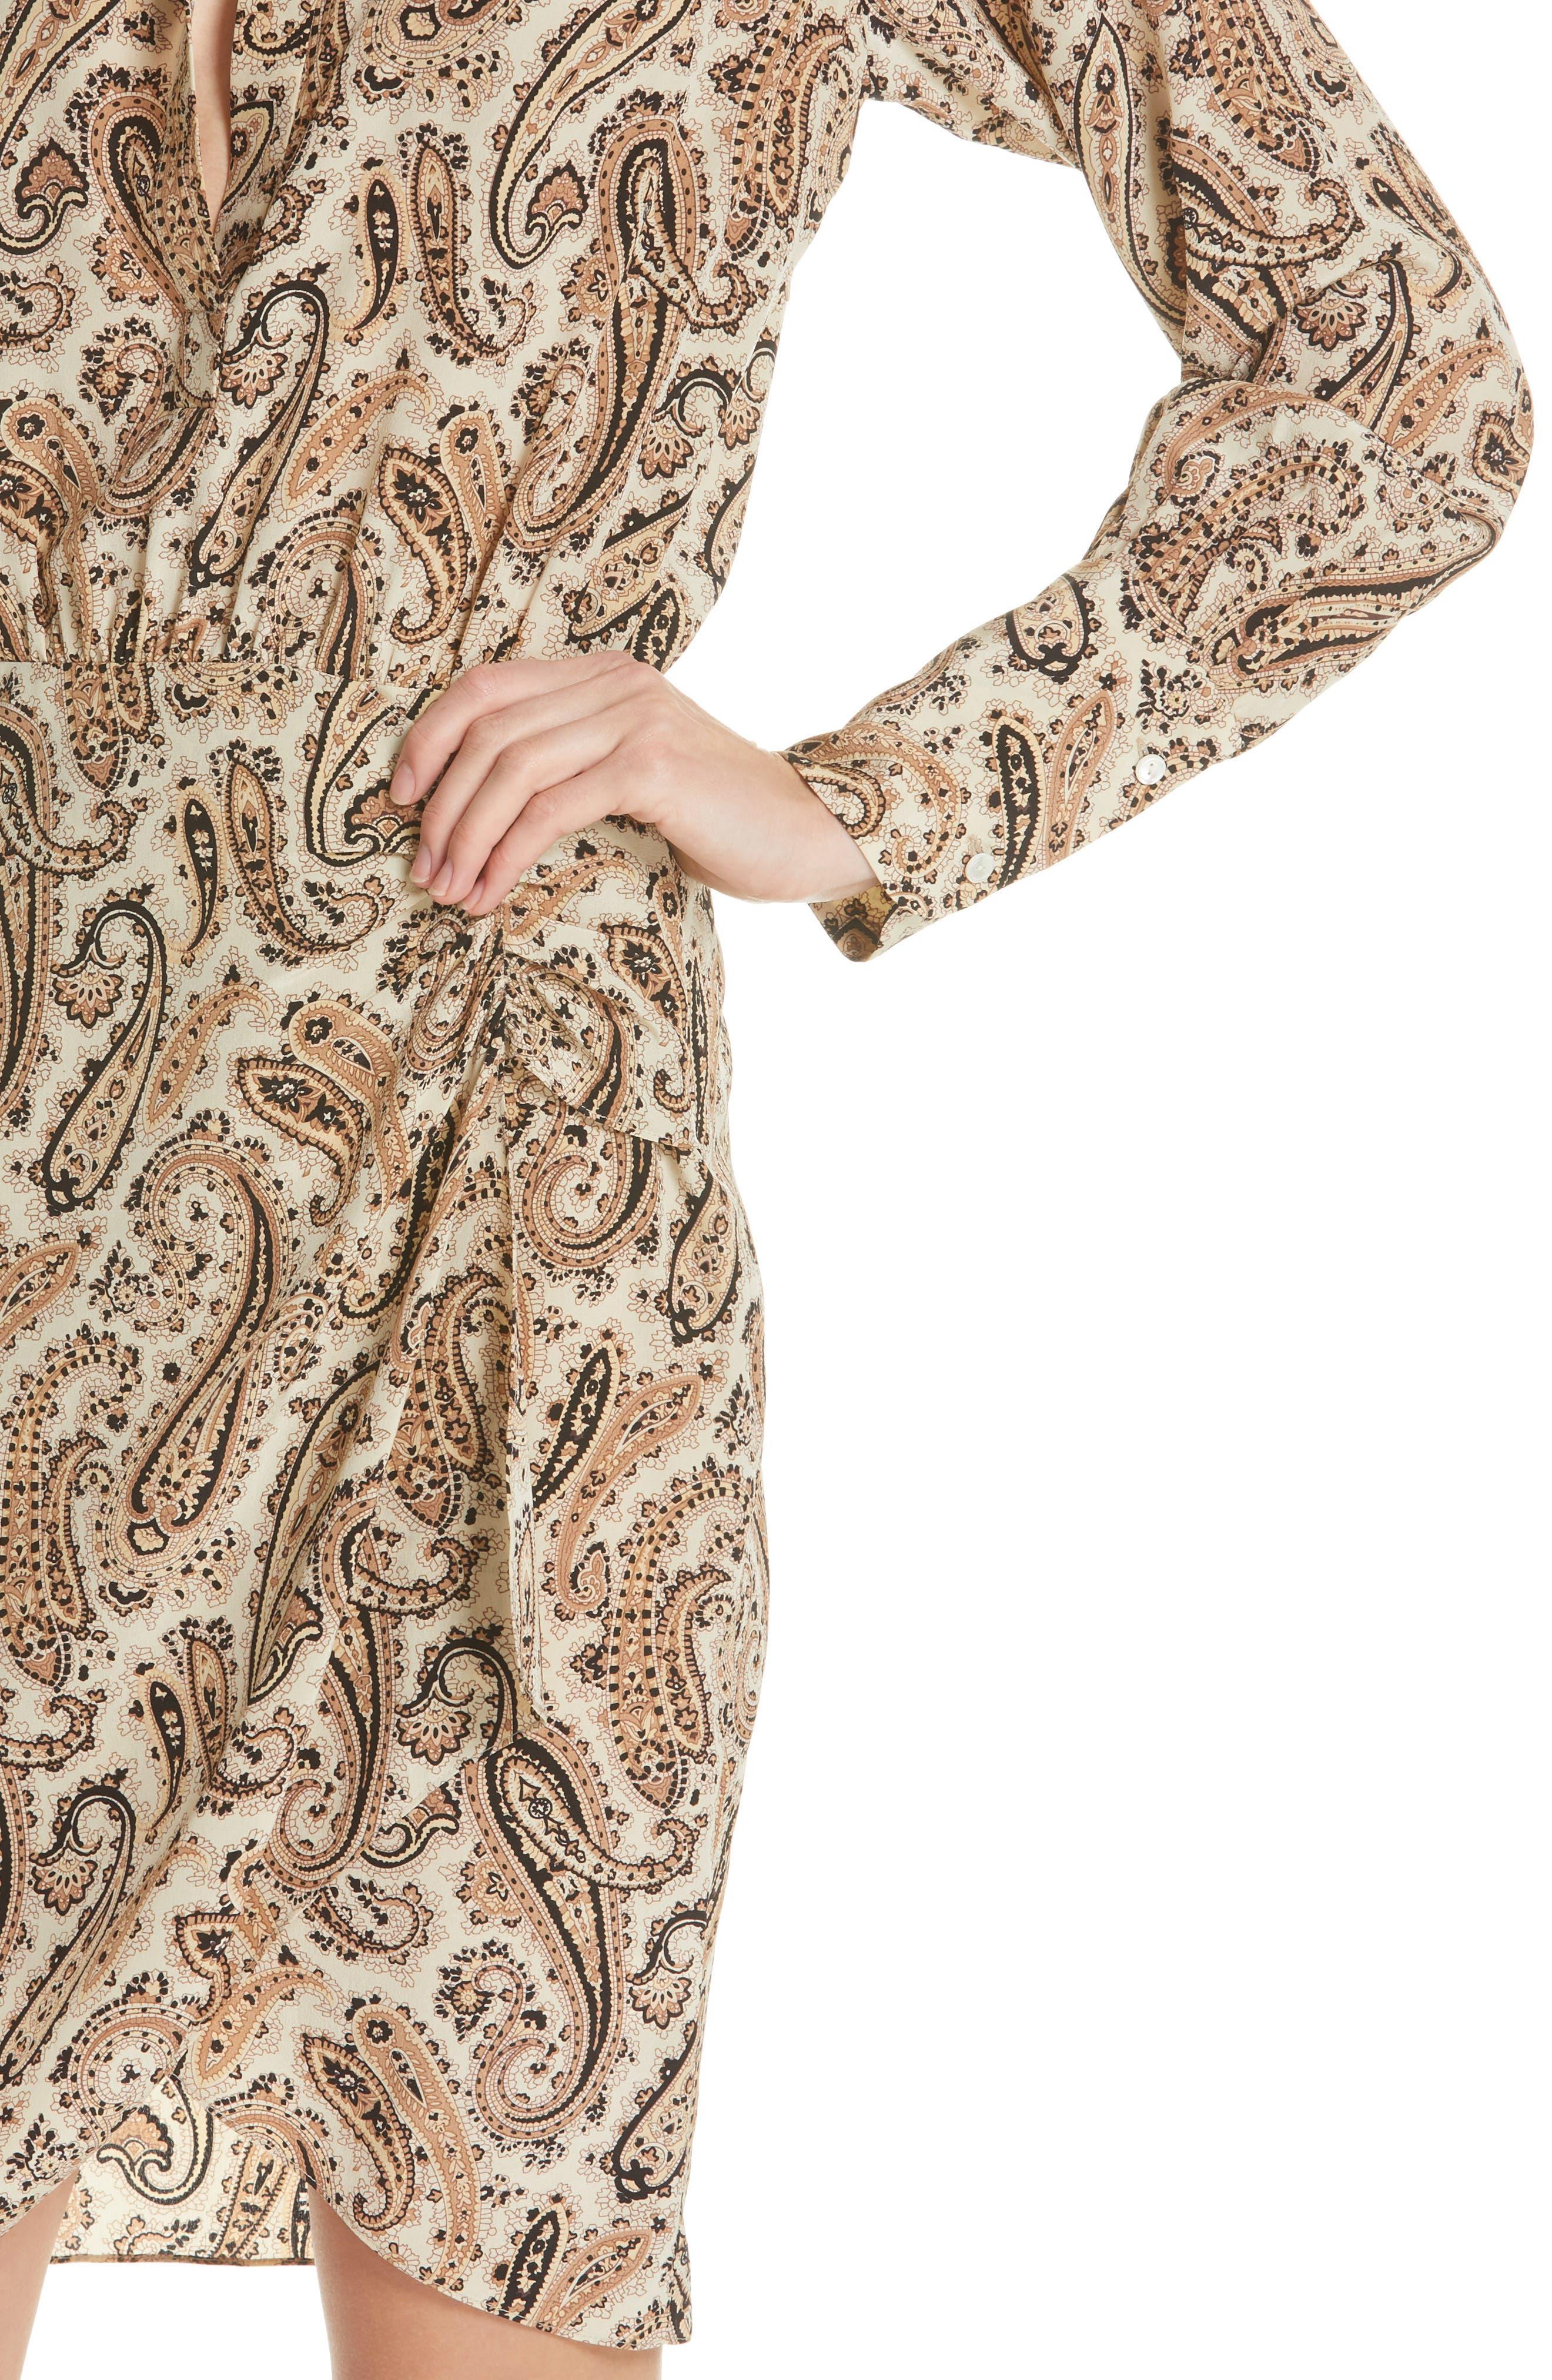 NILI LOTAN, Paisley Silk Shirtdress, Alternate thumbnail 5, color, BLACK AND BEIGE PAISLE